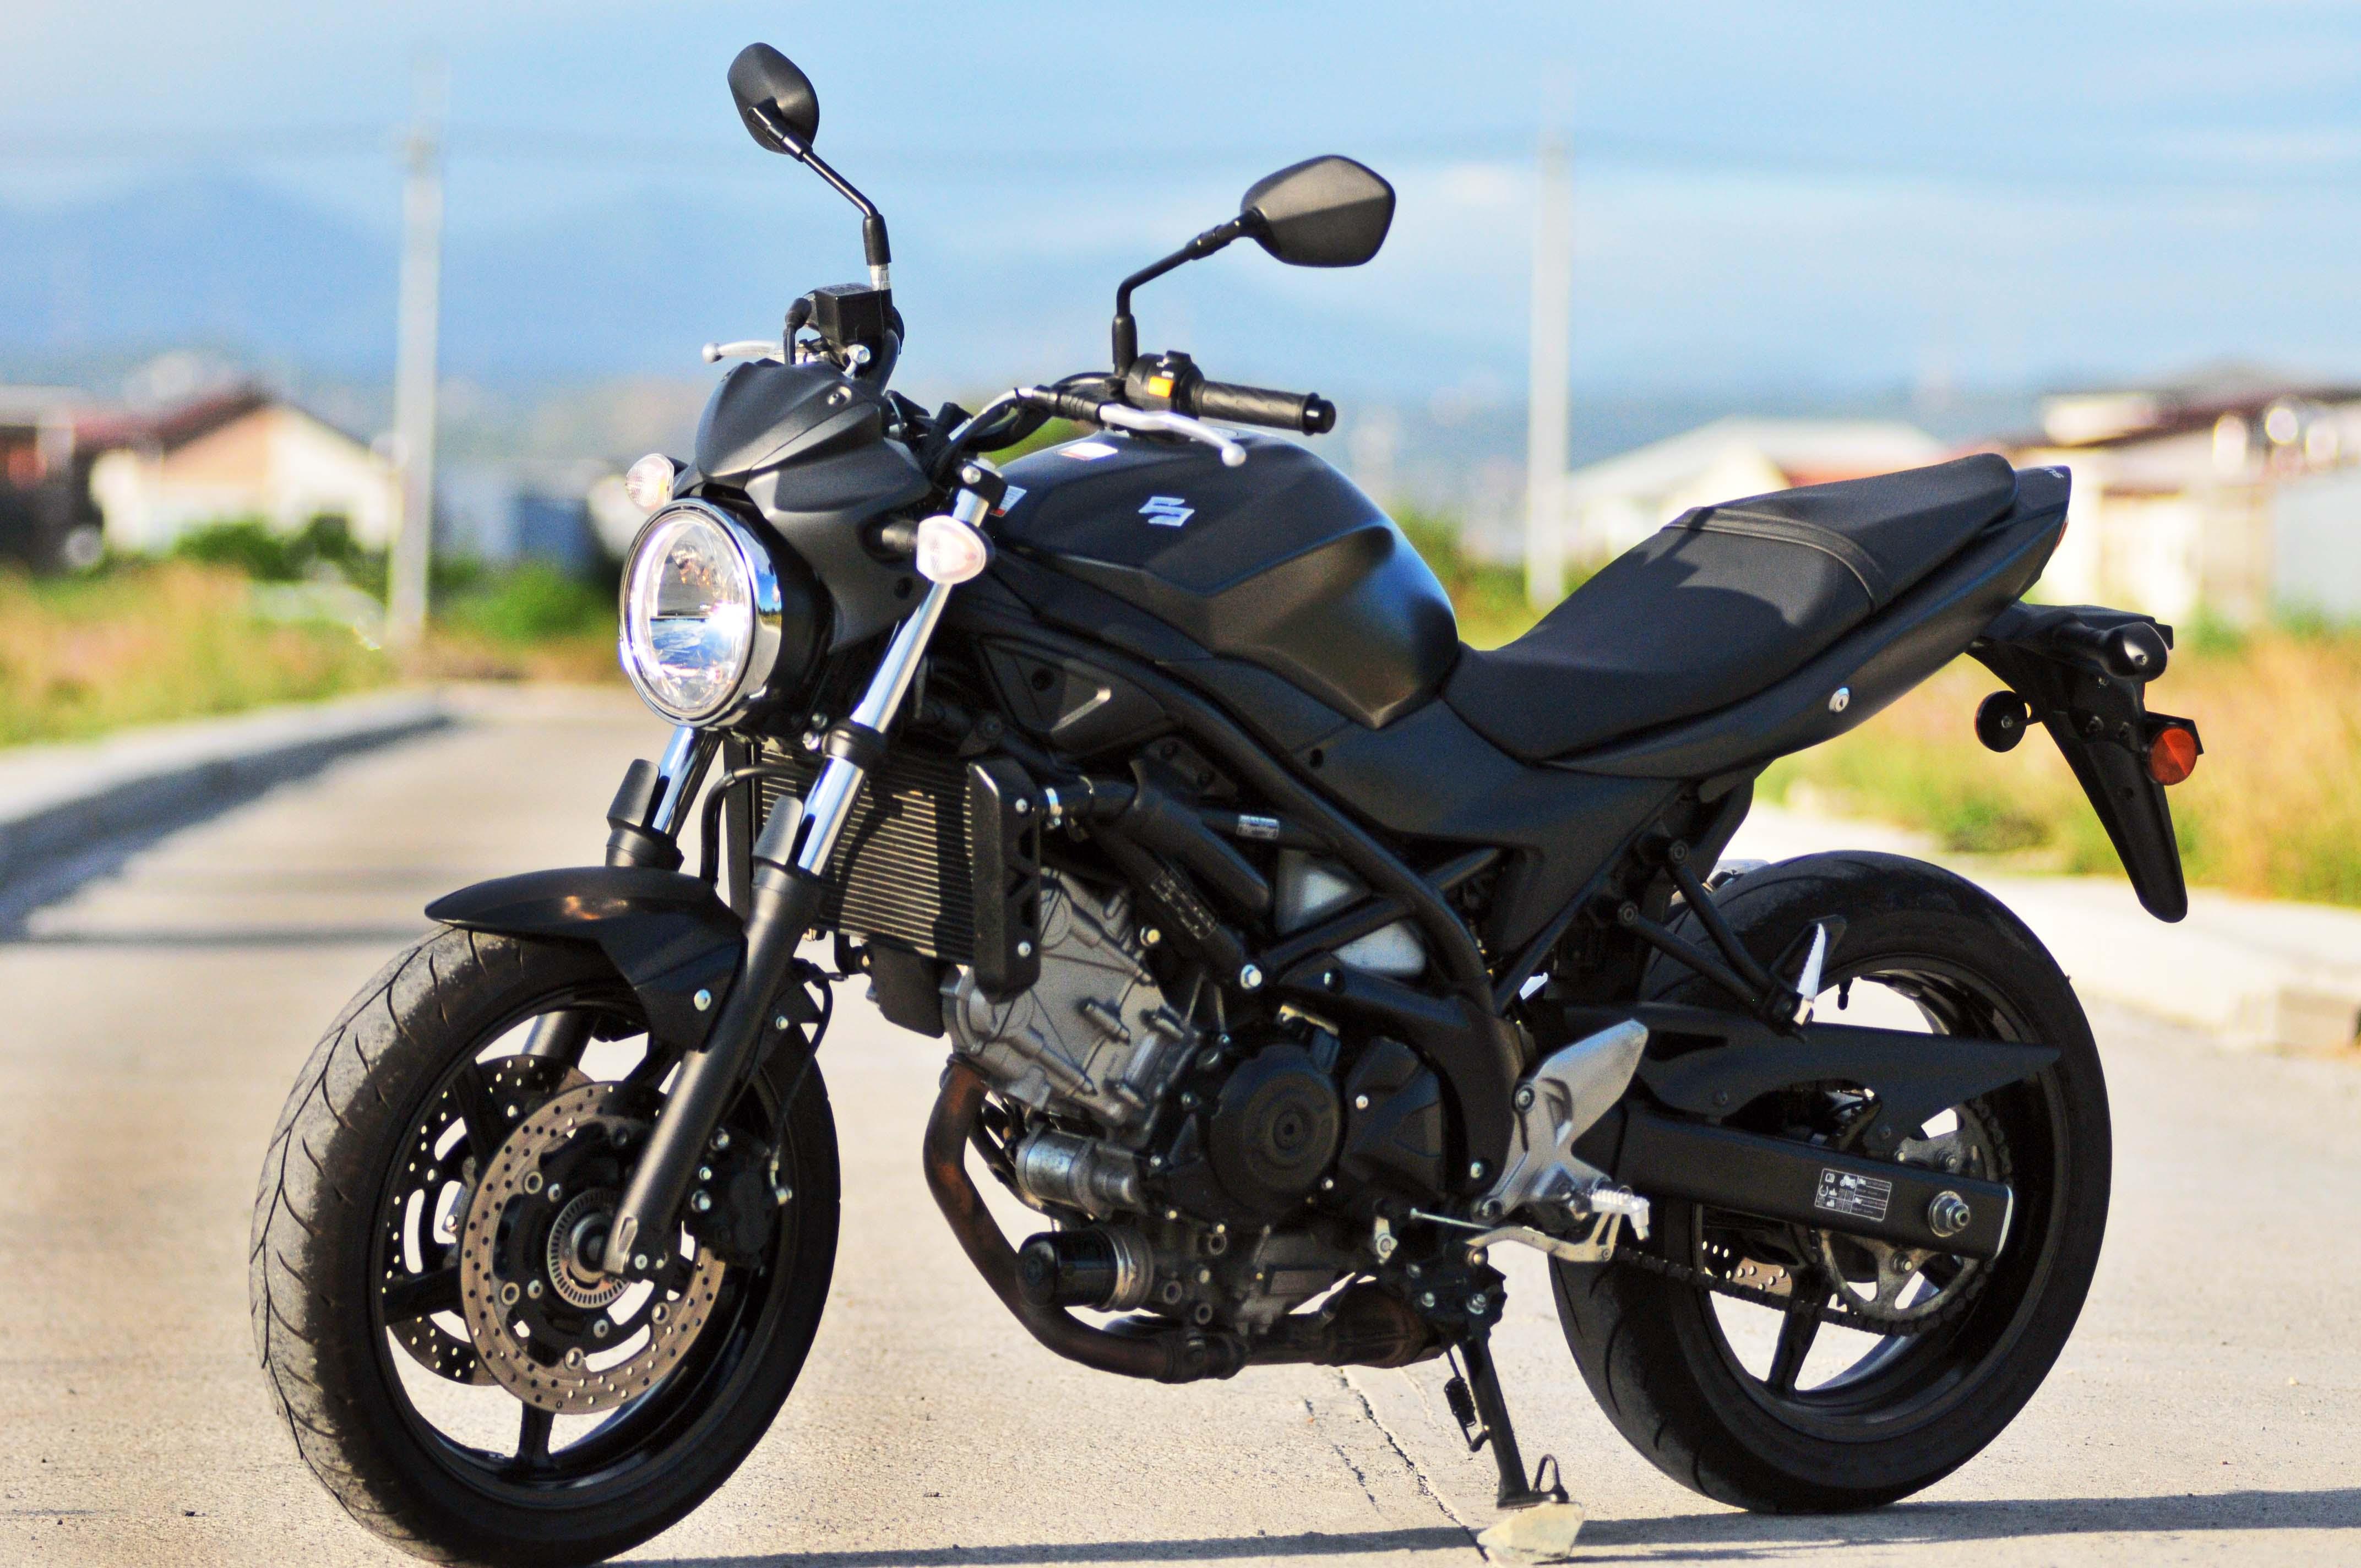 Suzuki Sv650s Review